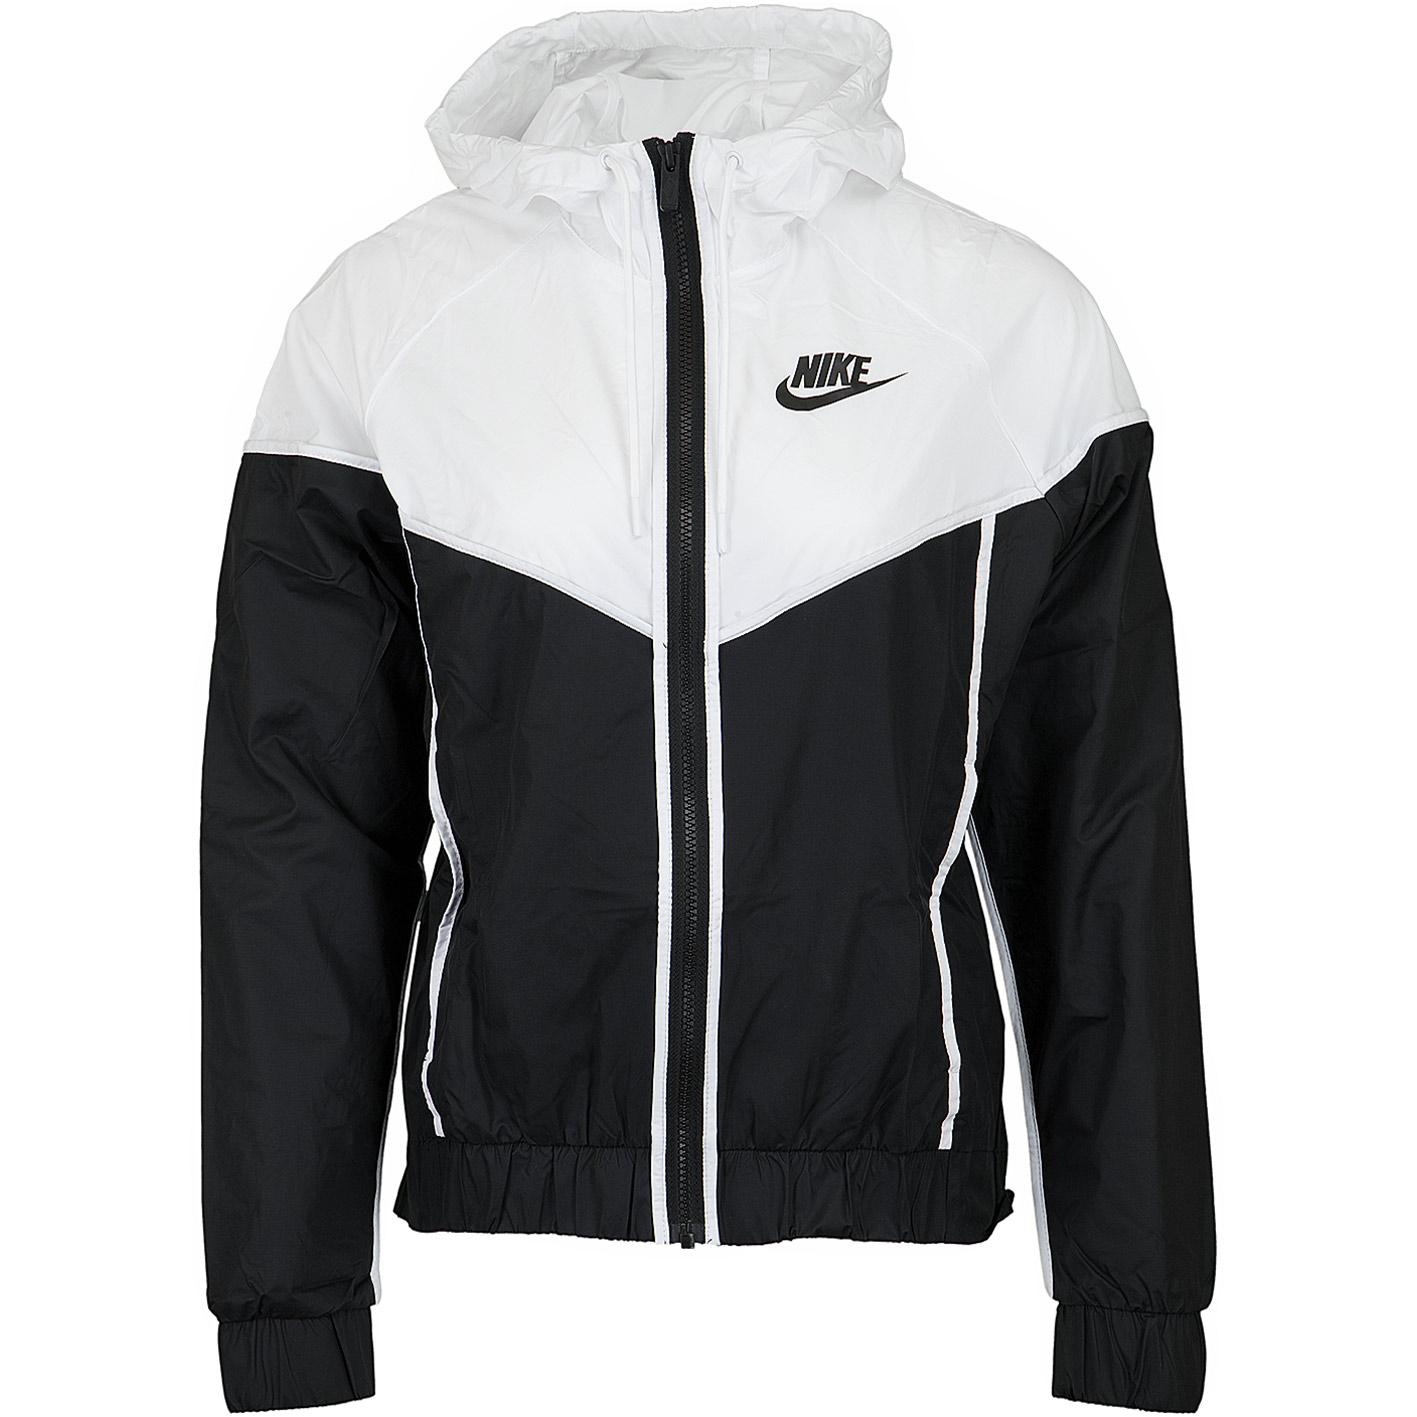 Nike Damen Trainingsjacke Heritage schwarzweiß